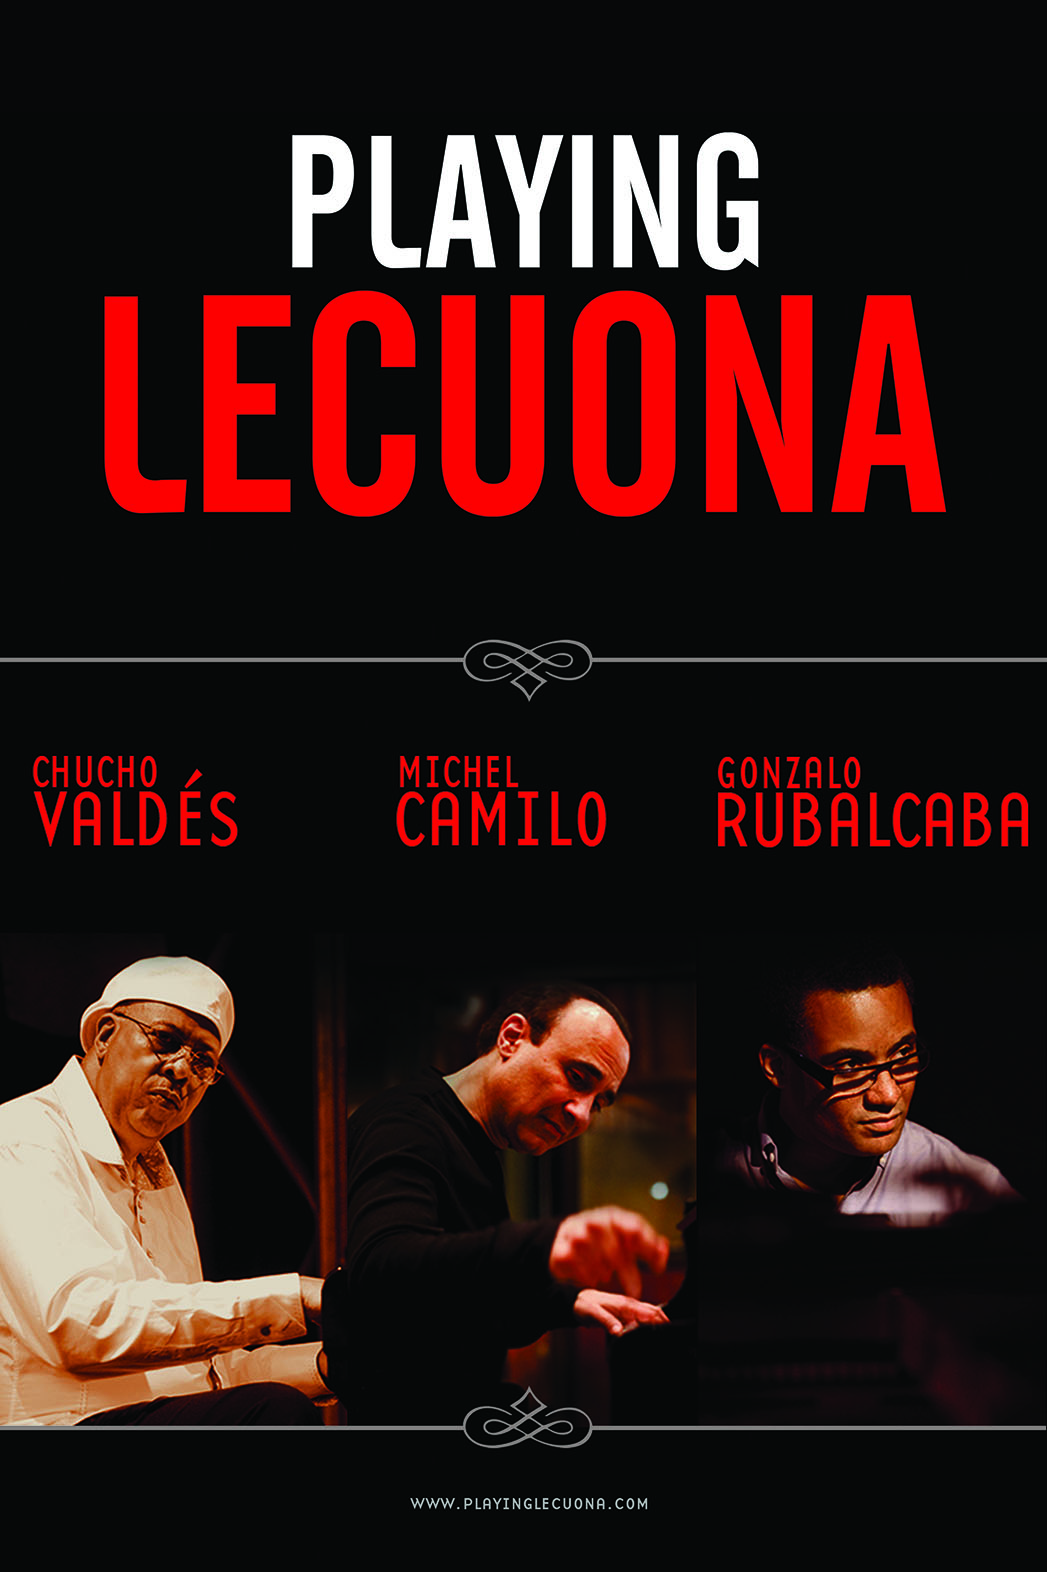 PLAYING LECUONA Key Art Poster - P 2015